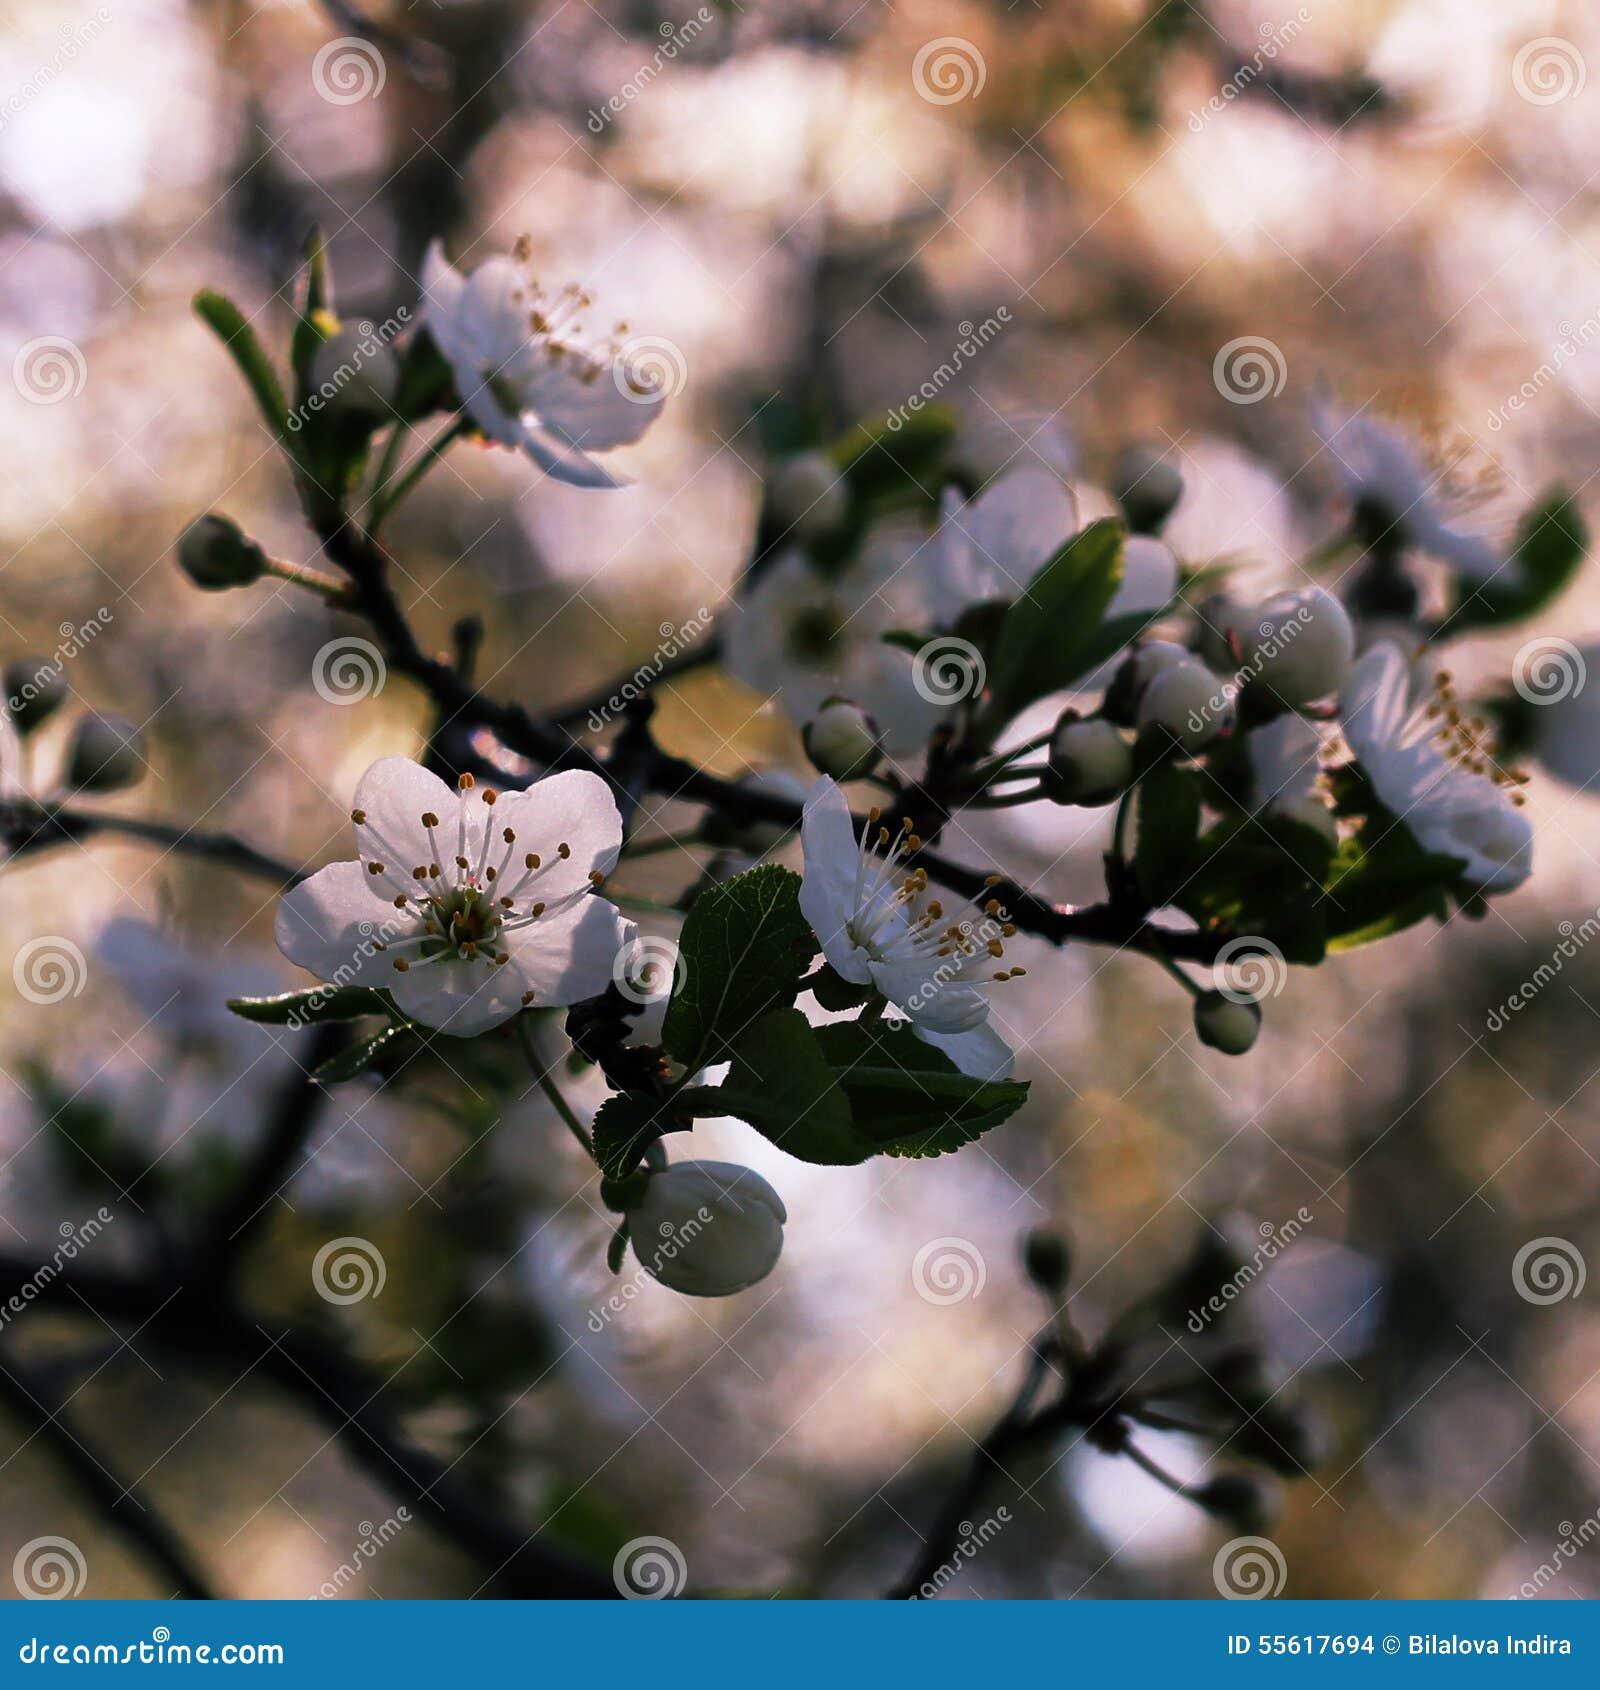 Blossom Cherry Flowers Stock Photo - Billede 55617694-1537